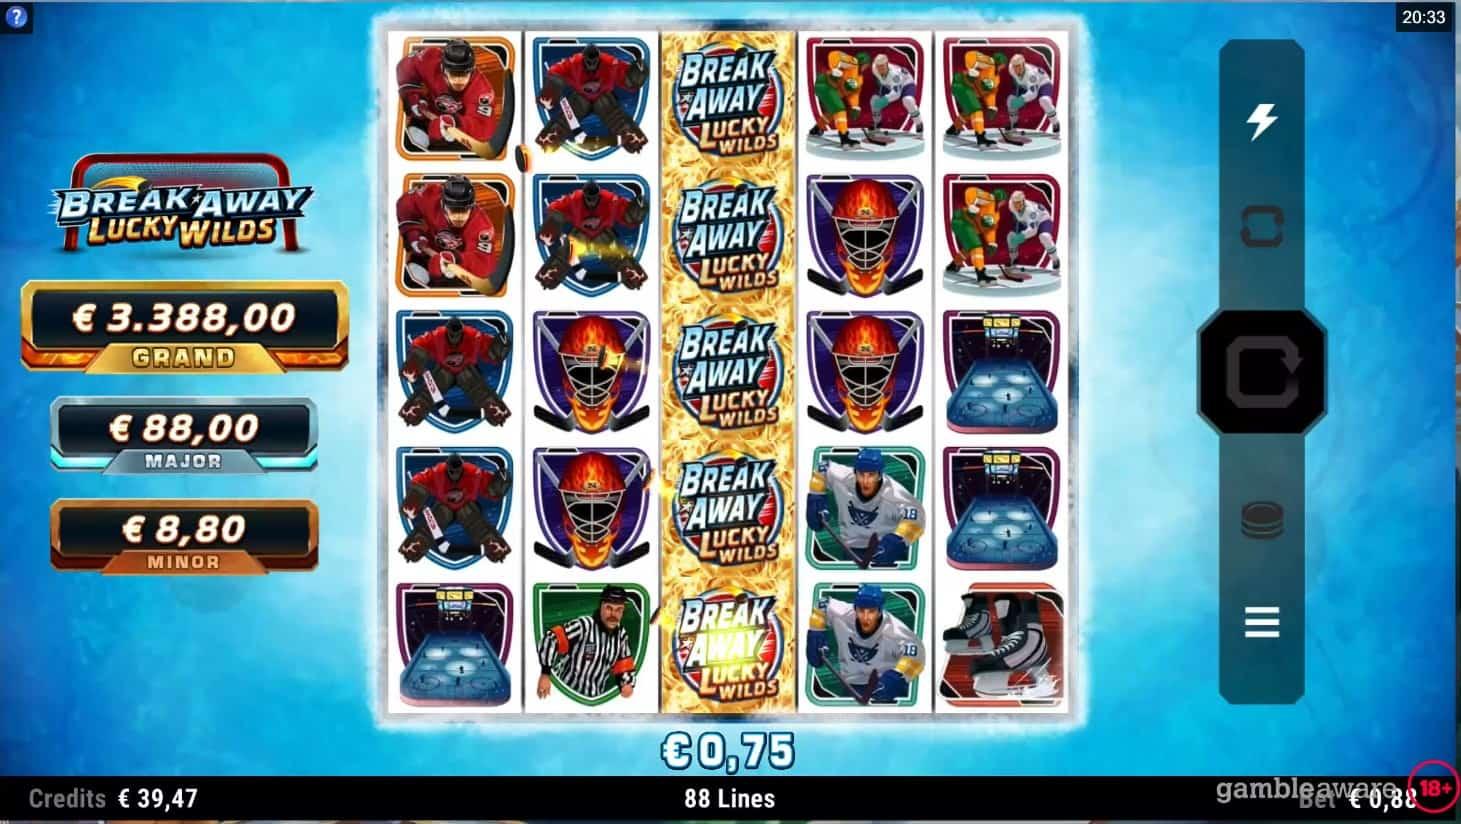 Break Away Lucky Wilds Slot Free Play